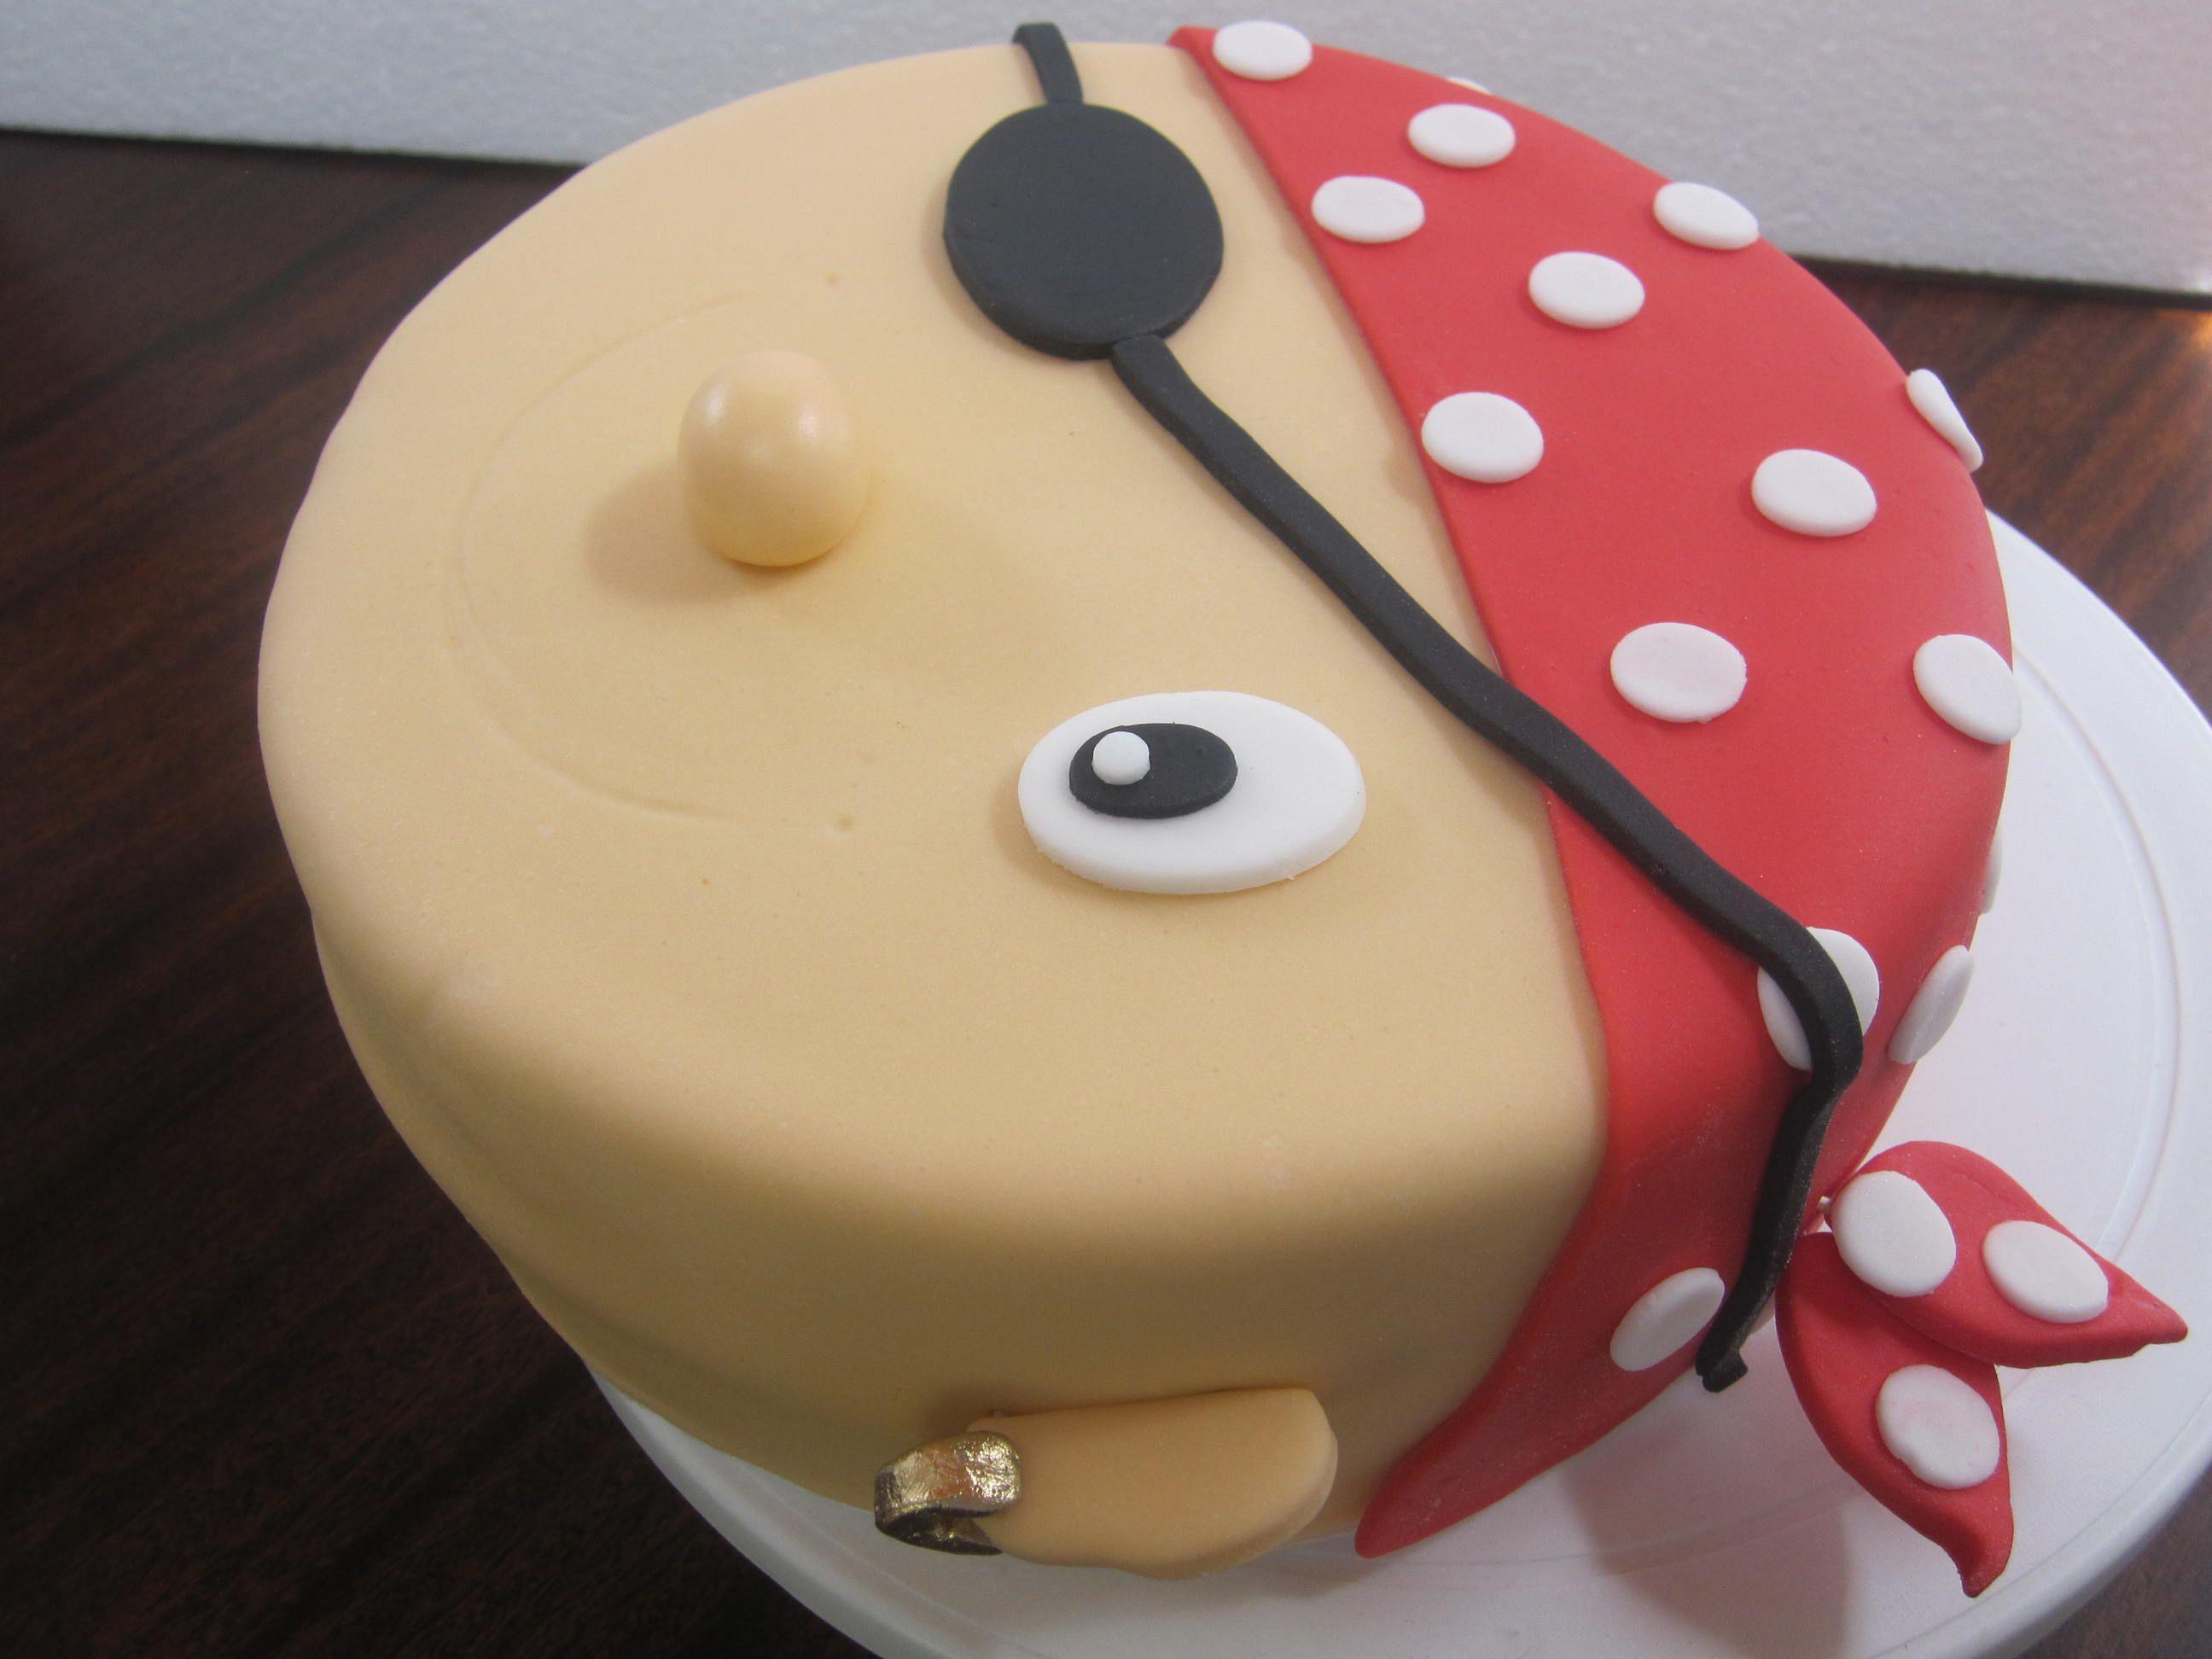 Pirate Face Cake Mocka Mocka Piratecake Ponque Pirate